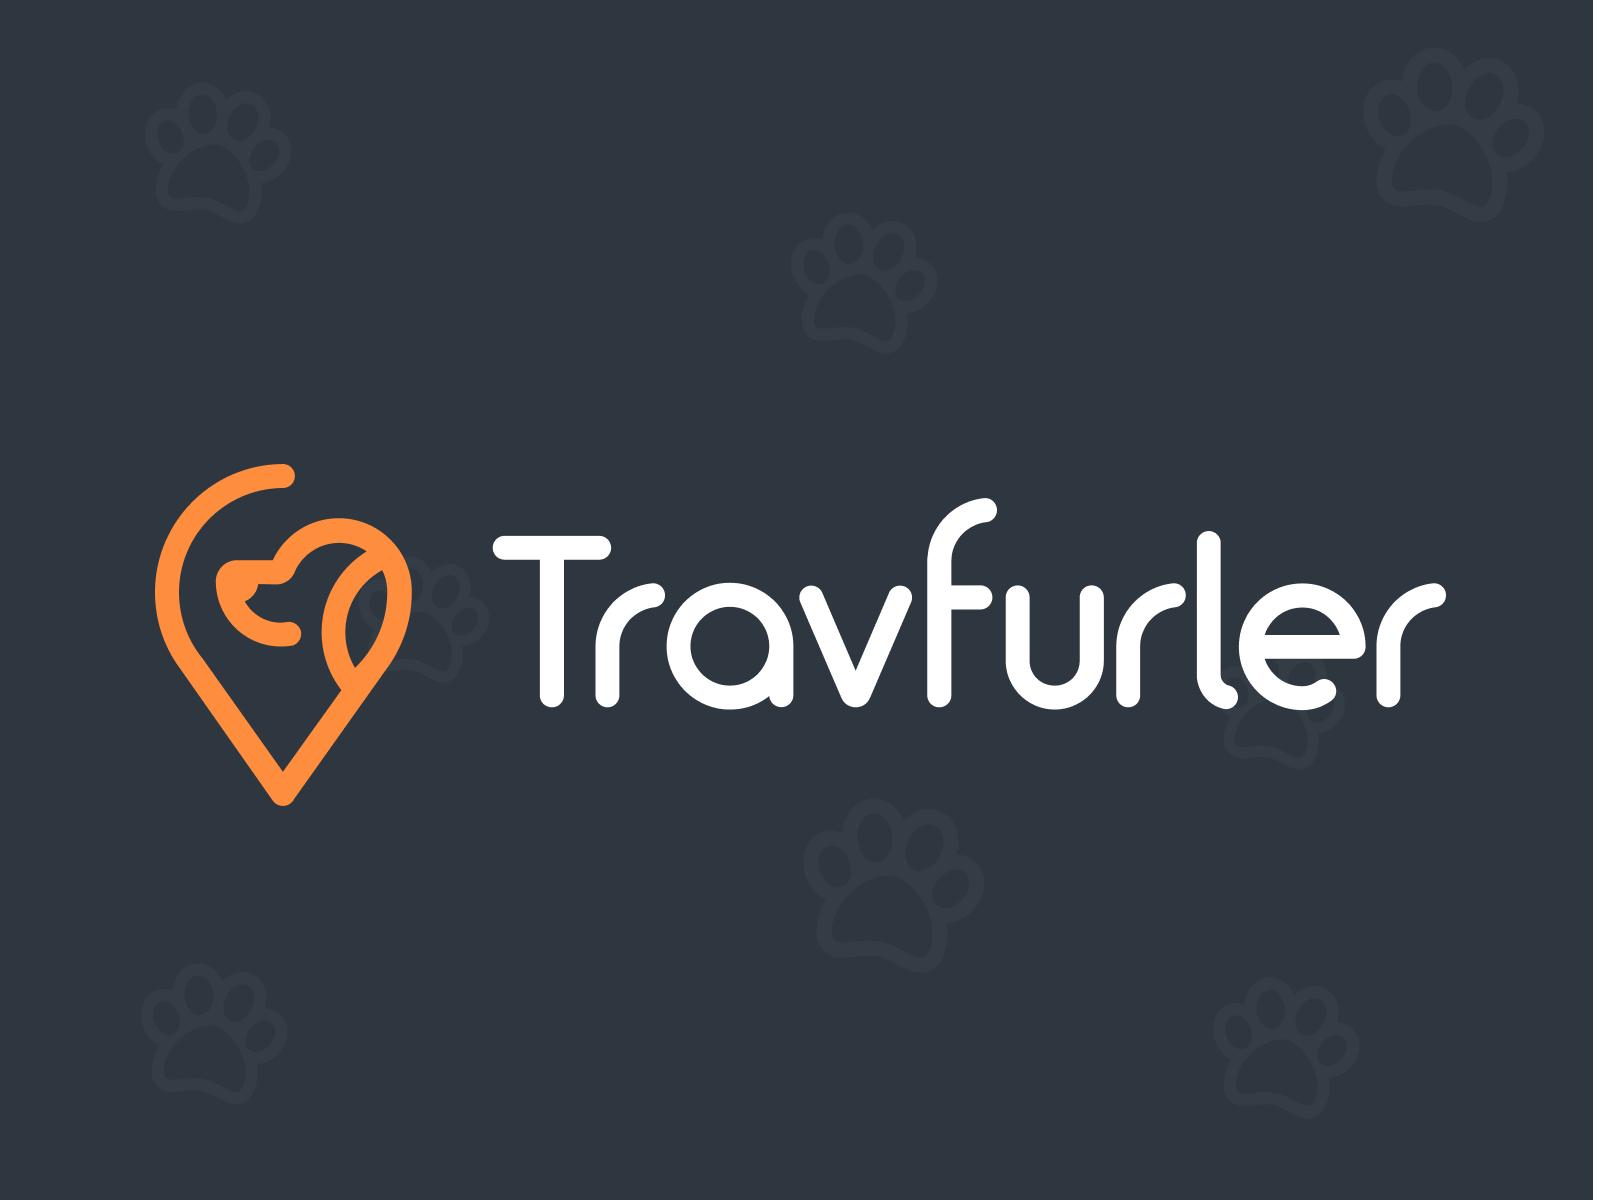 TRAVFULER_logo_dribbble1